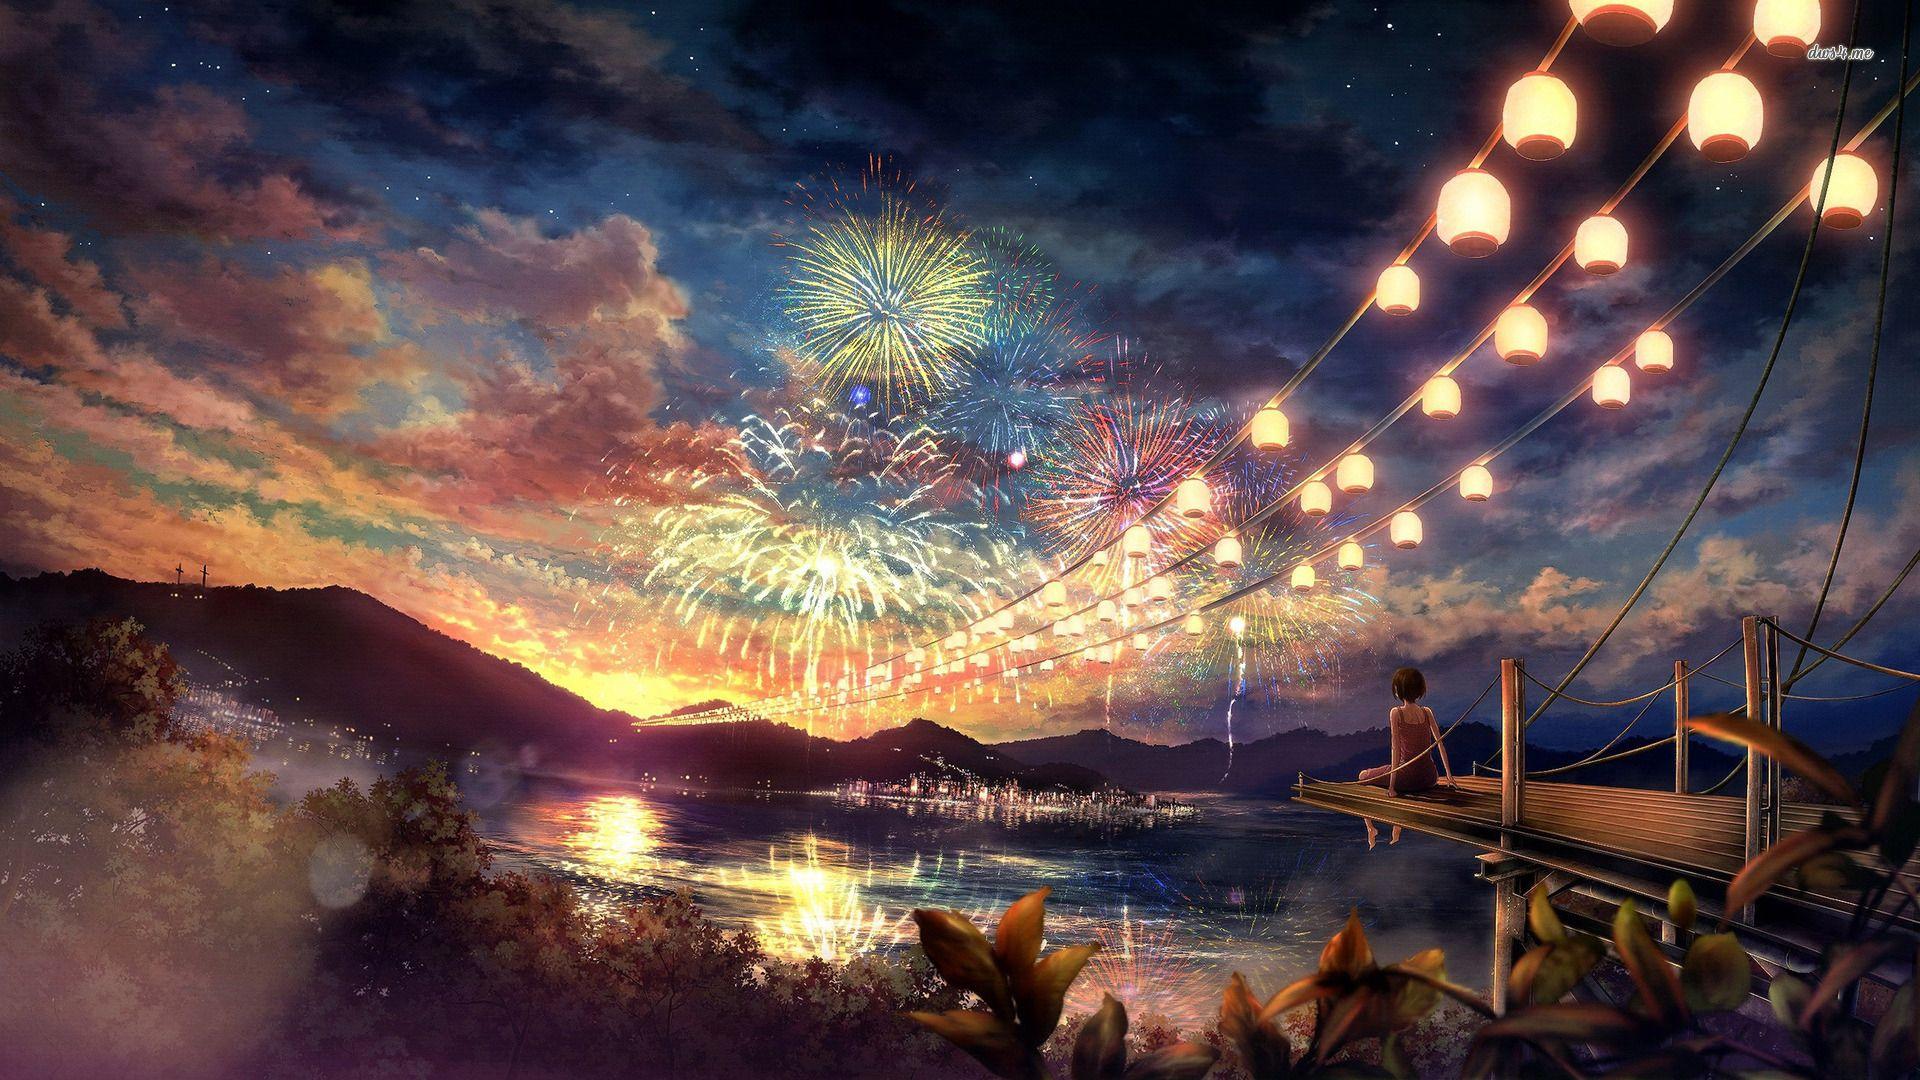 Girl Watching The Fireworks Wallpaper 背景画 風景 綺麗な風景